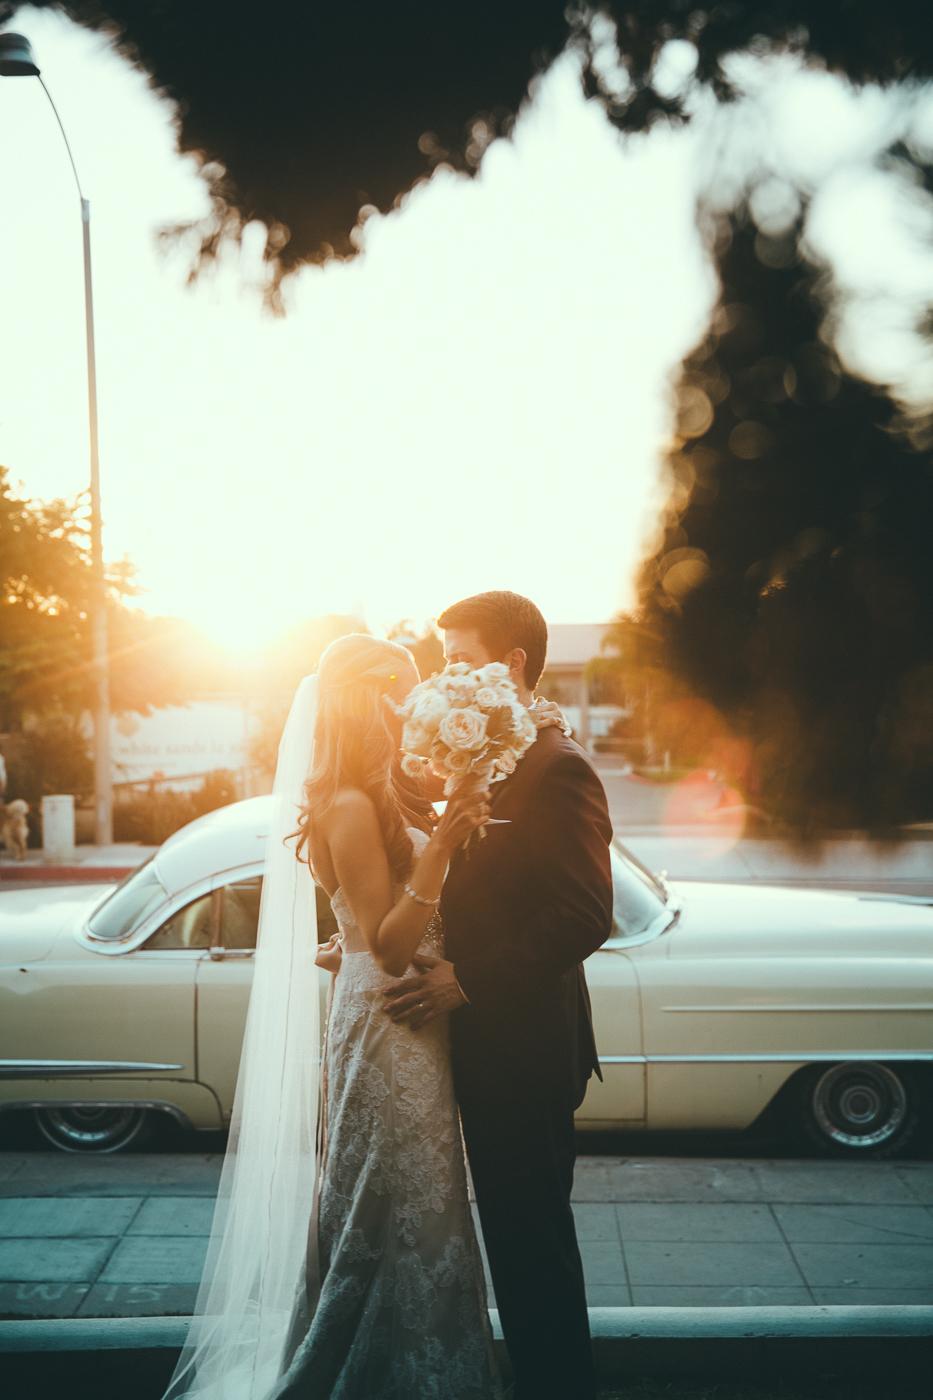 RYAN_&_KELLEY_DARLINGTON_HOUSE_WEDDING_2014_7X9A2493.JPG